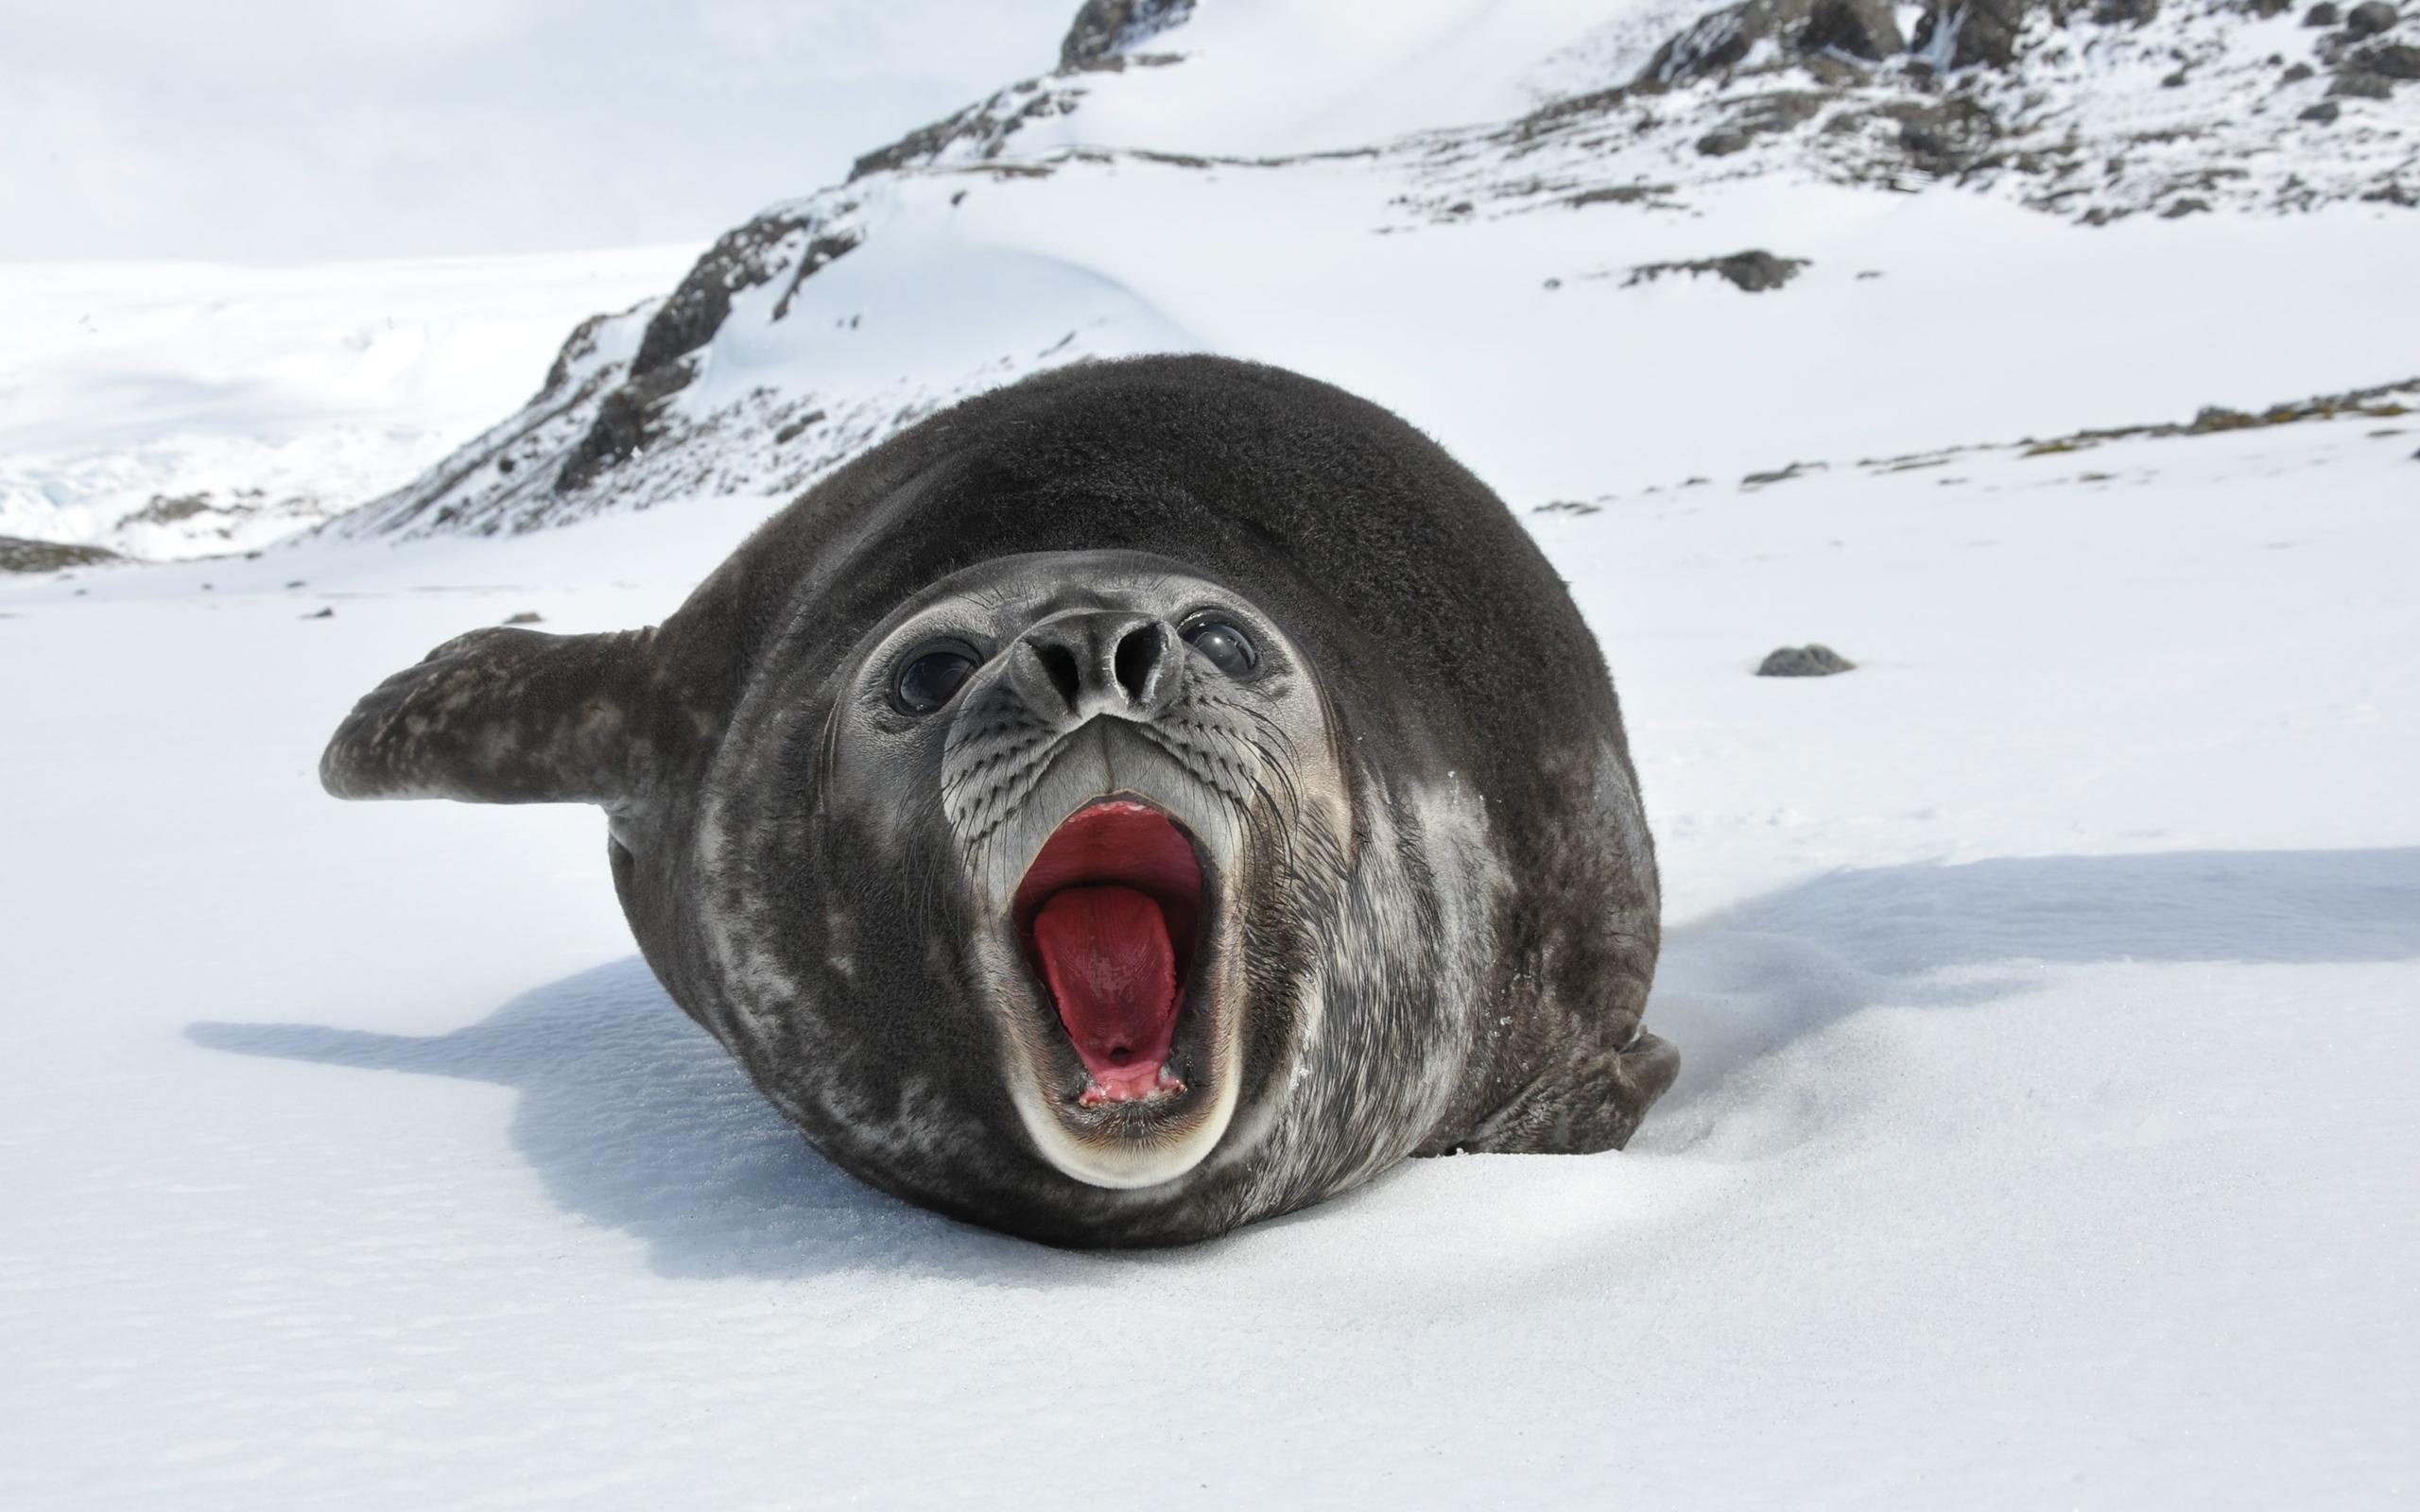 sea lion animal wallpaper background 52668